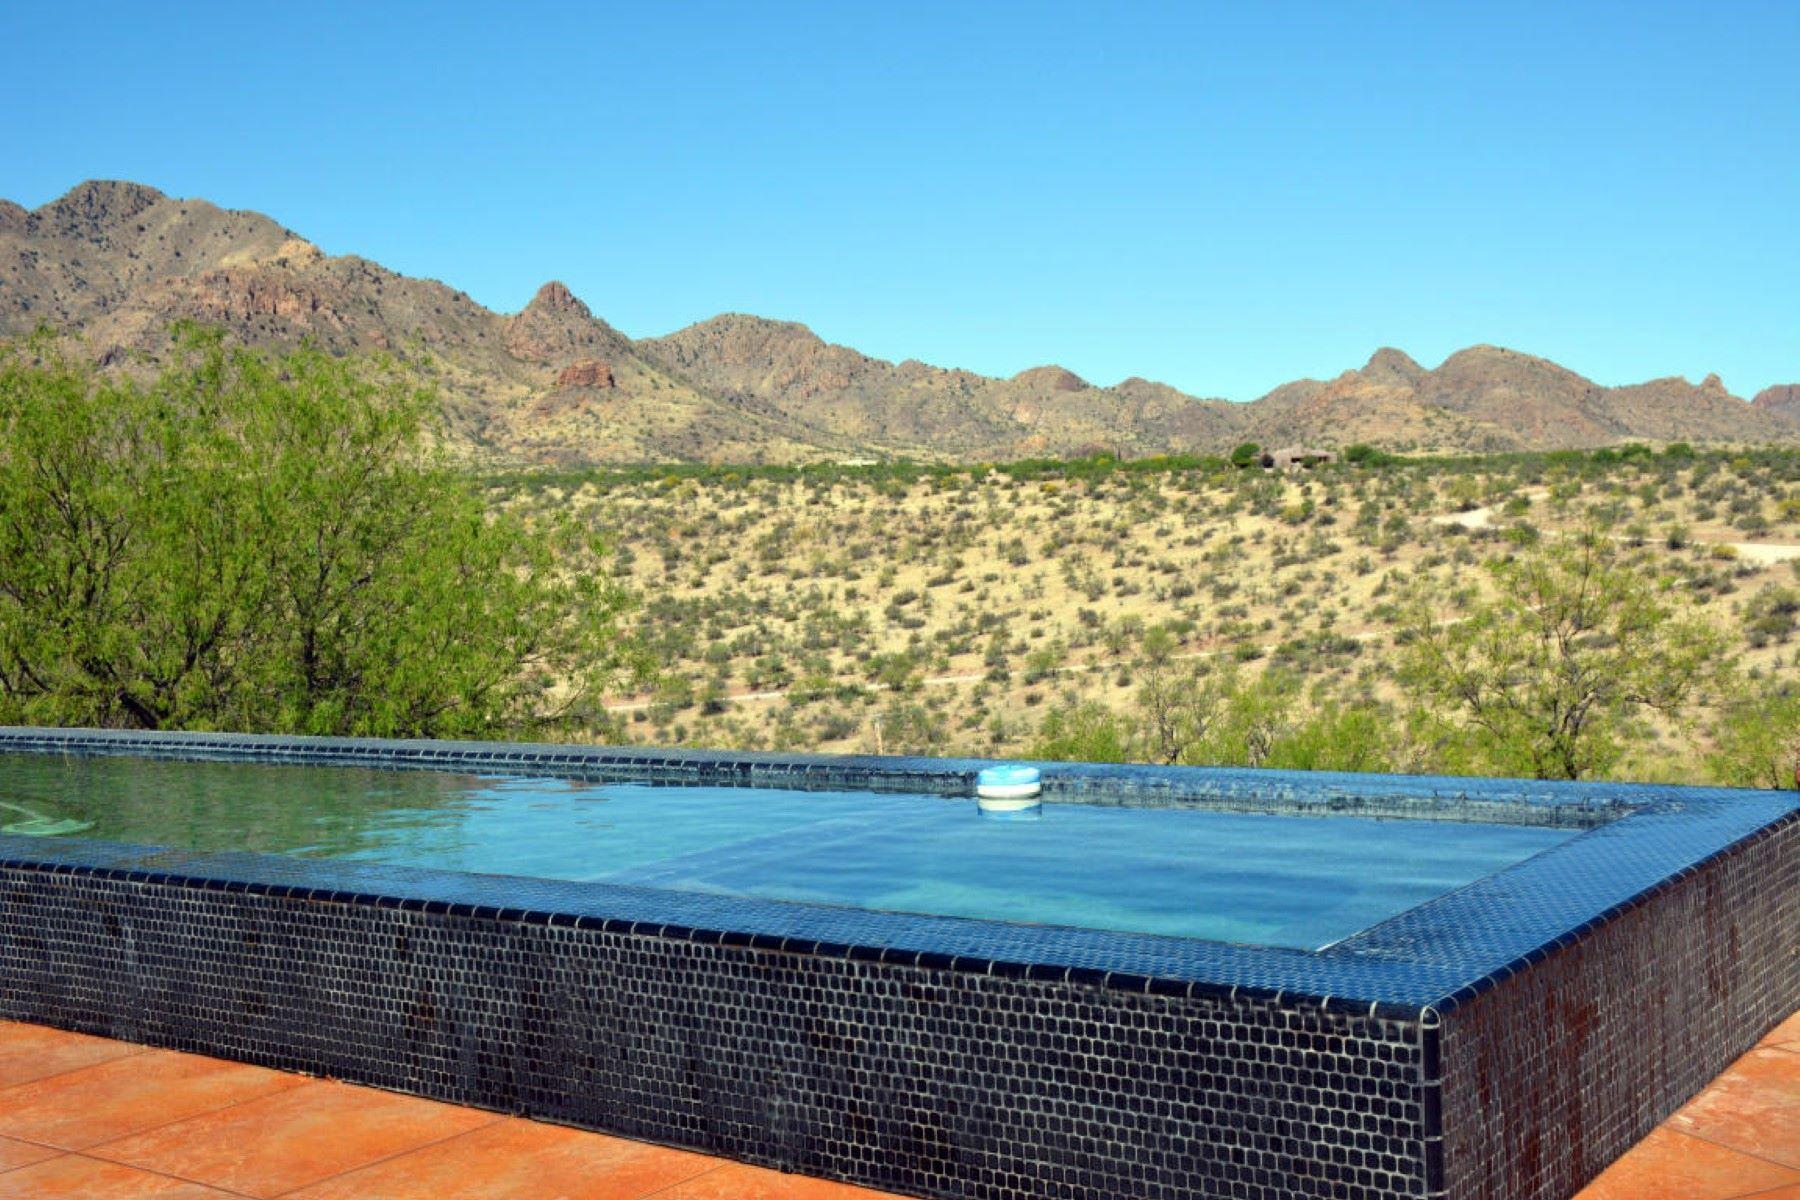 独户住宅 为 销售 在 Custom California contempory home 33 Guadalupe Lane 图巴克, 亚利桑那州, 85646 美国